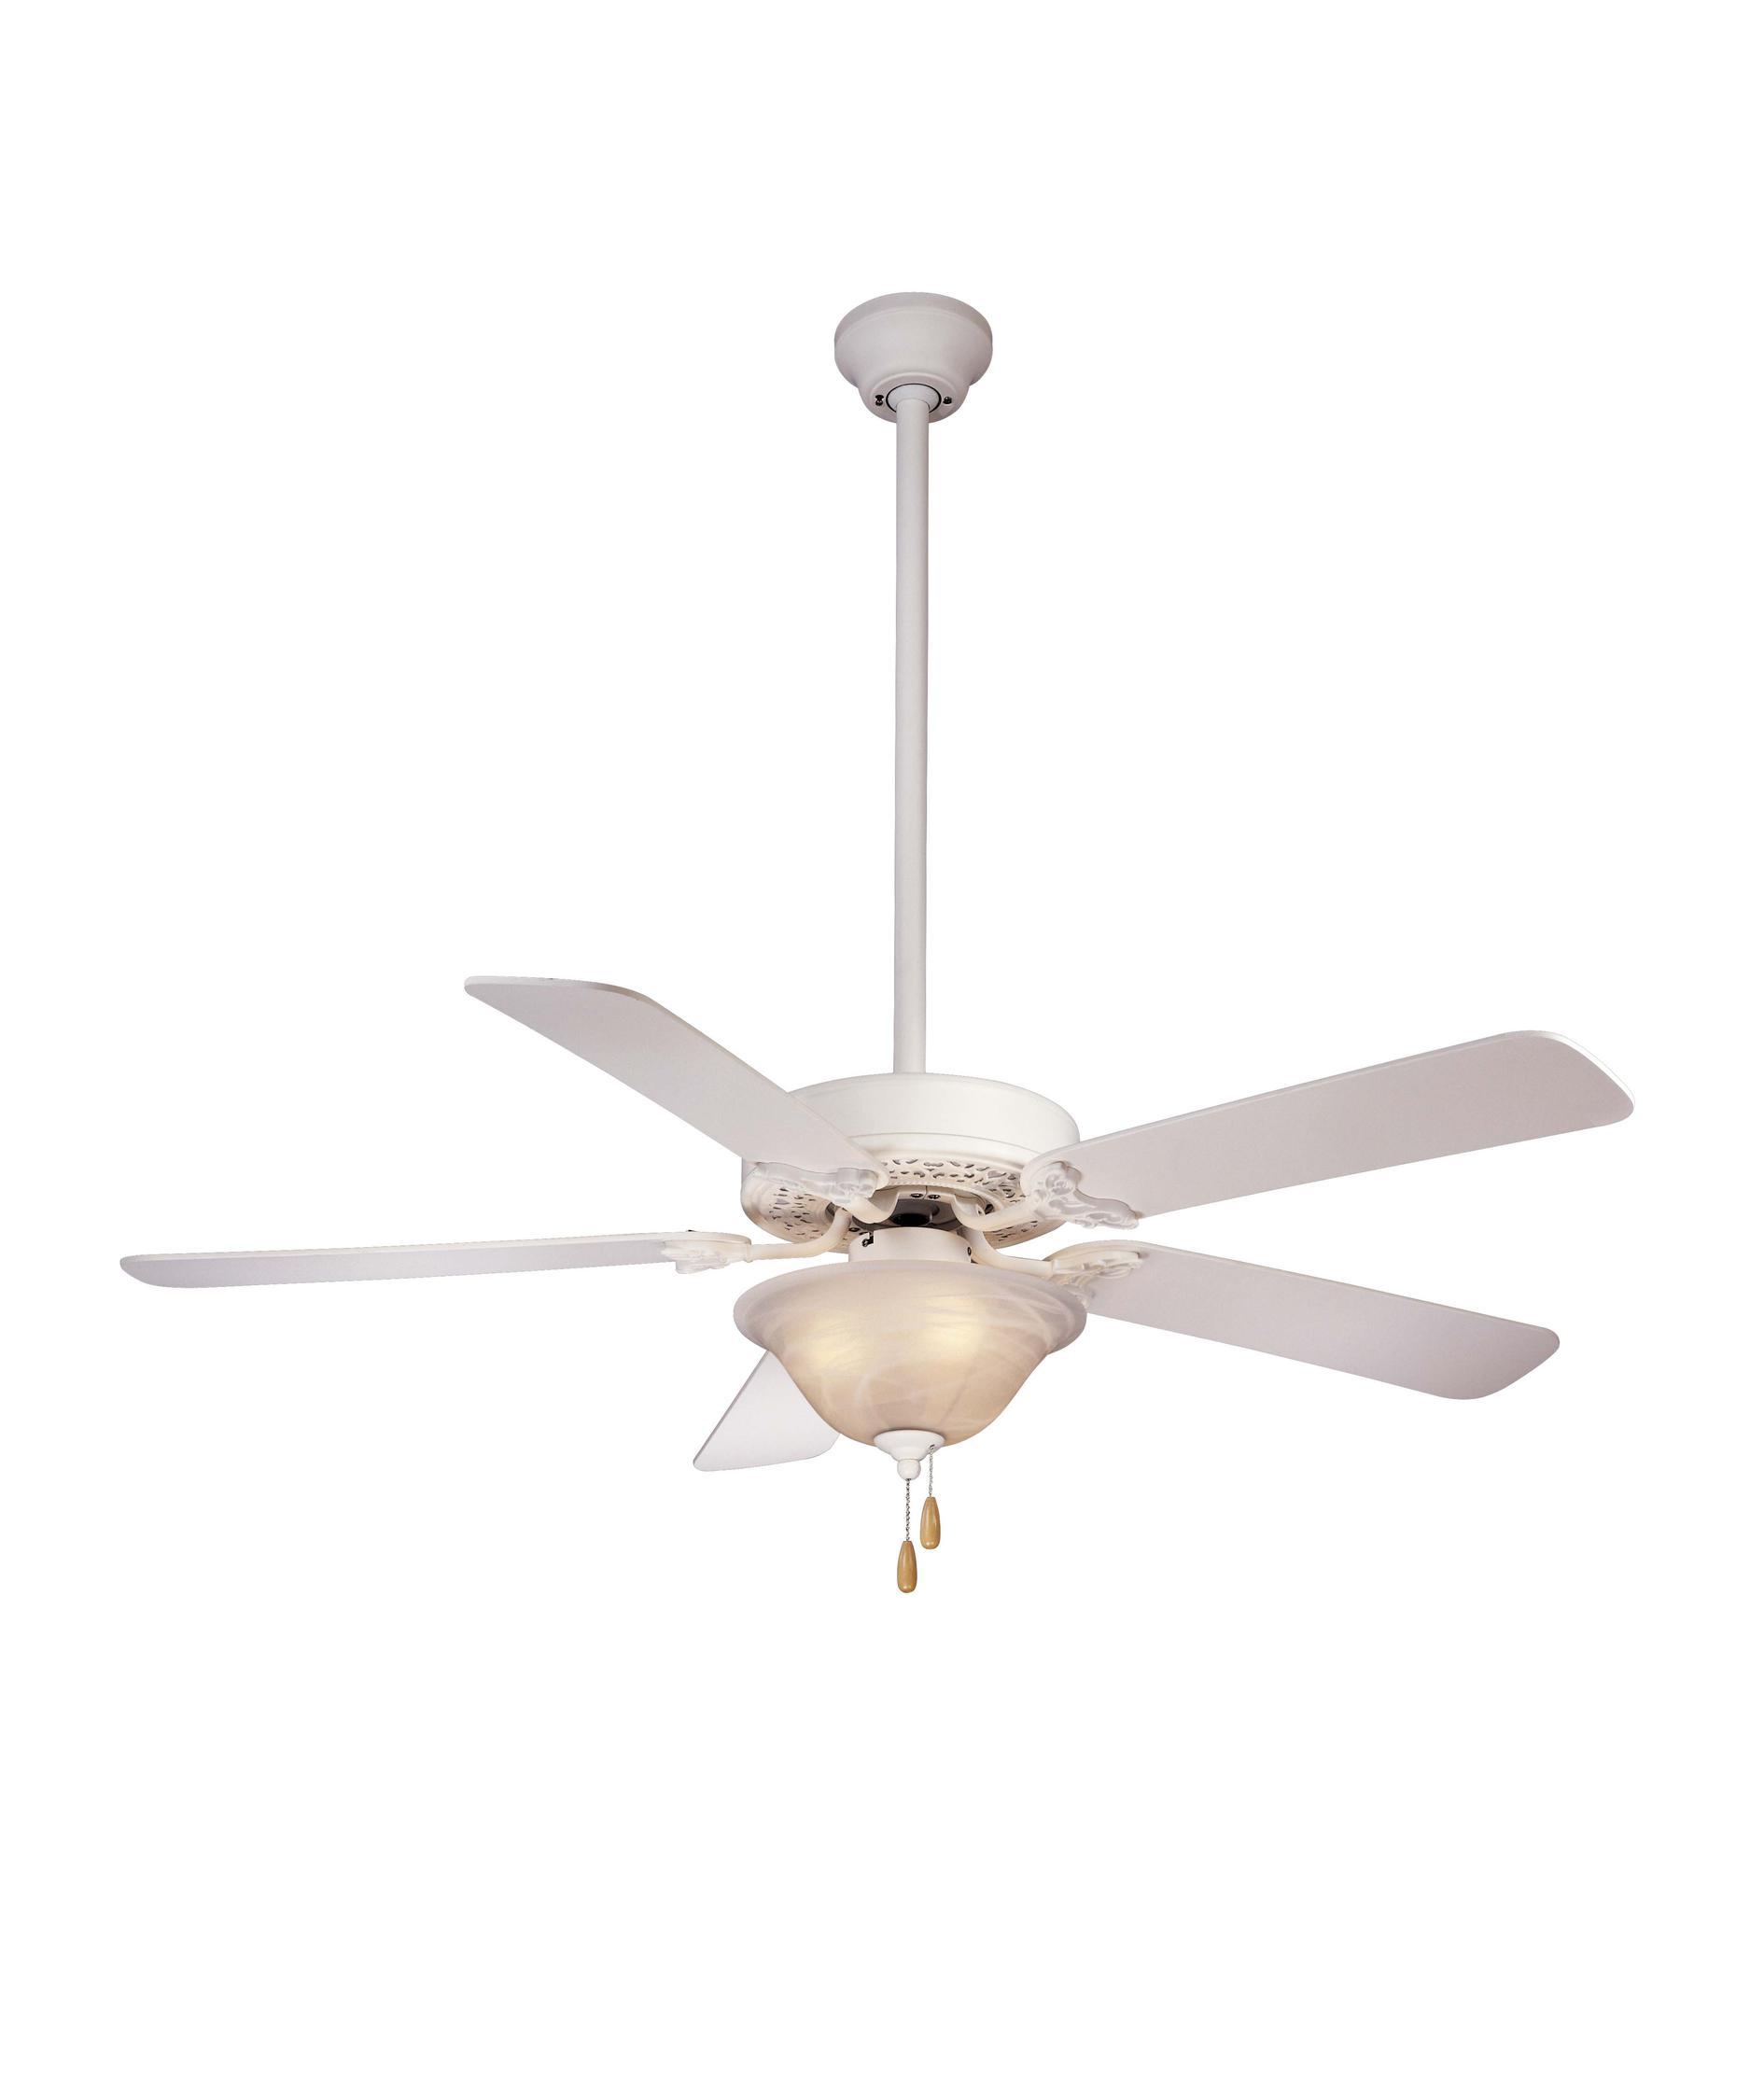 minka aire f558 lizette unipack 52 inch ceiling fan with light kit. Black Bedroom Furniture Sets. Home Design Ideas